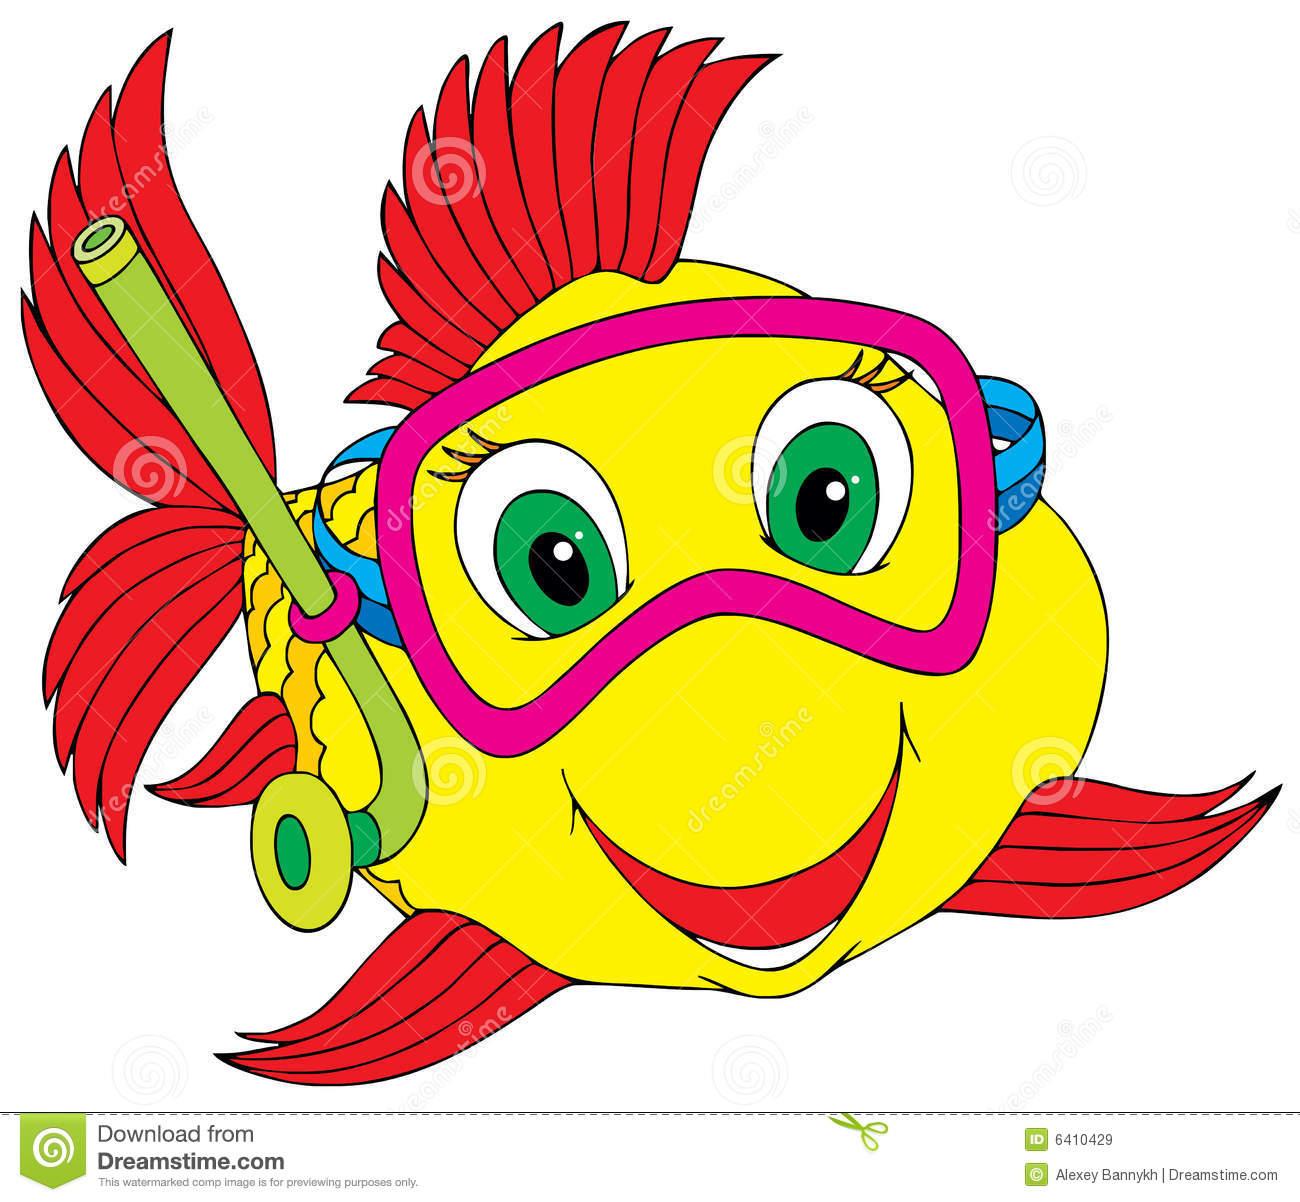 ocean fish clipart - Clipground